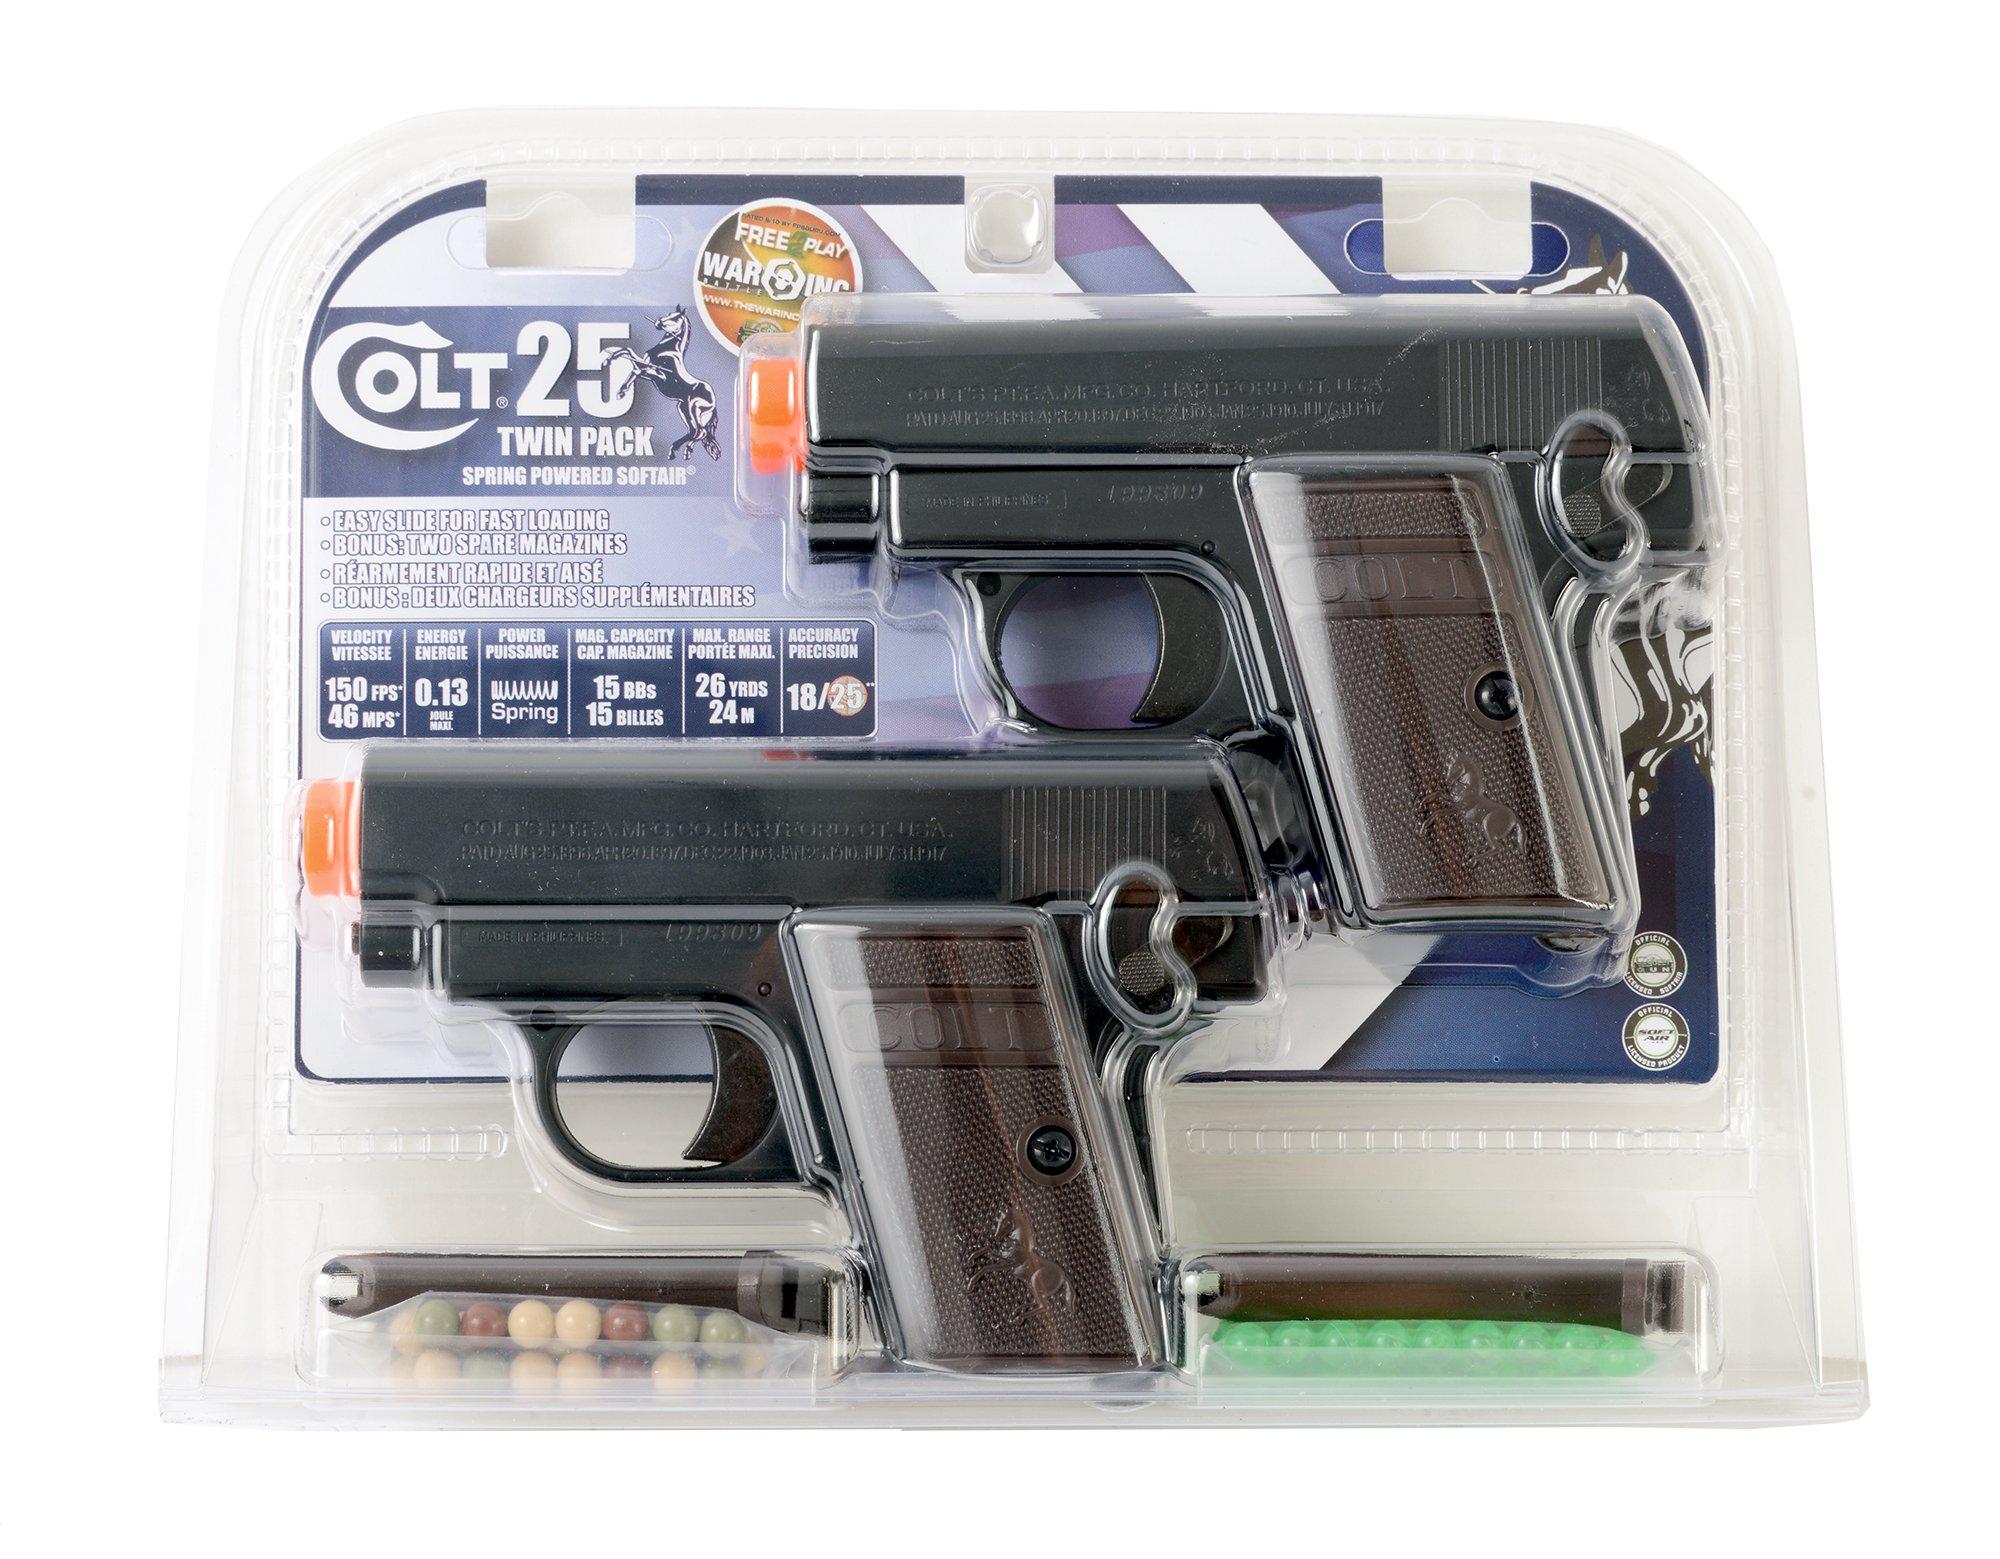 Pistola Colt .25 Spring Airsoft